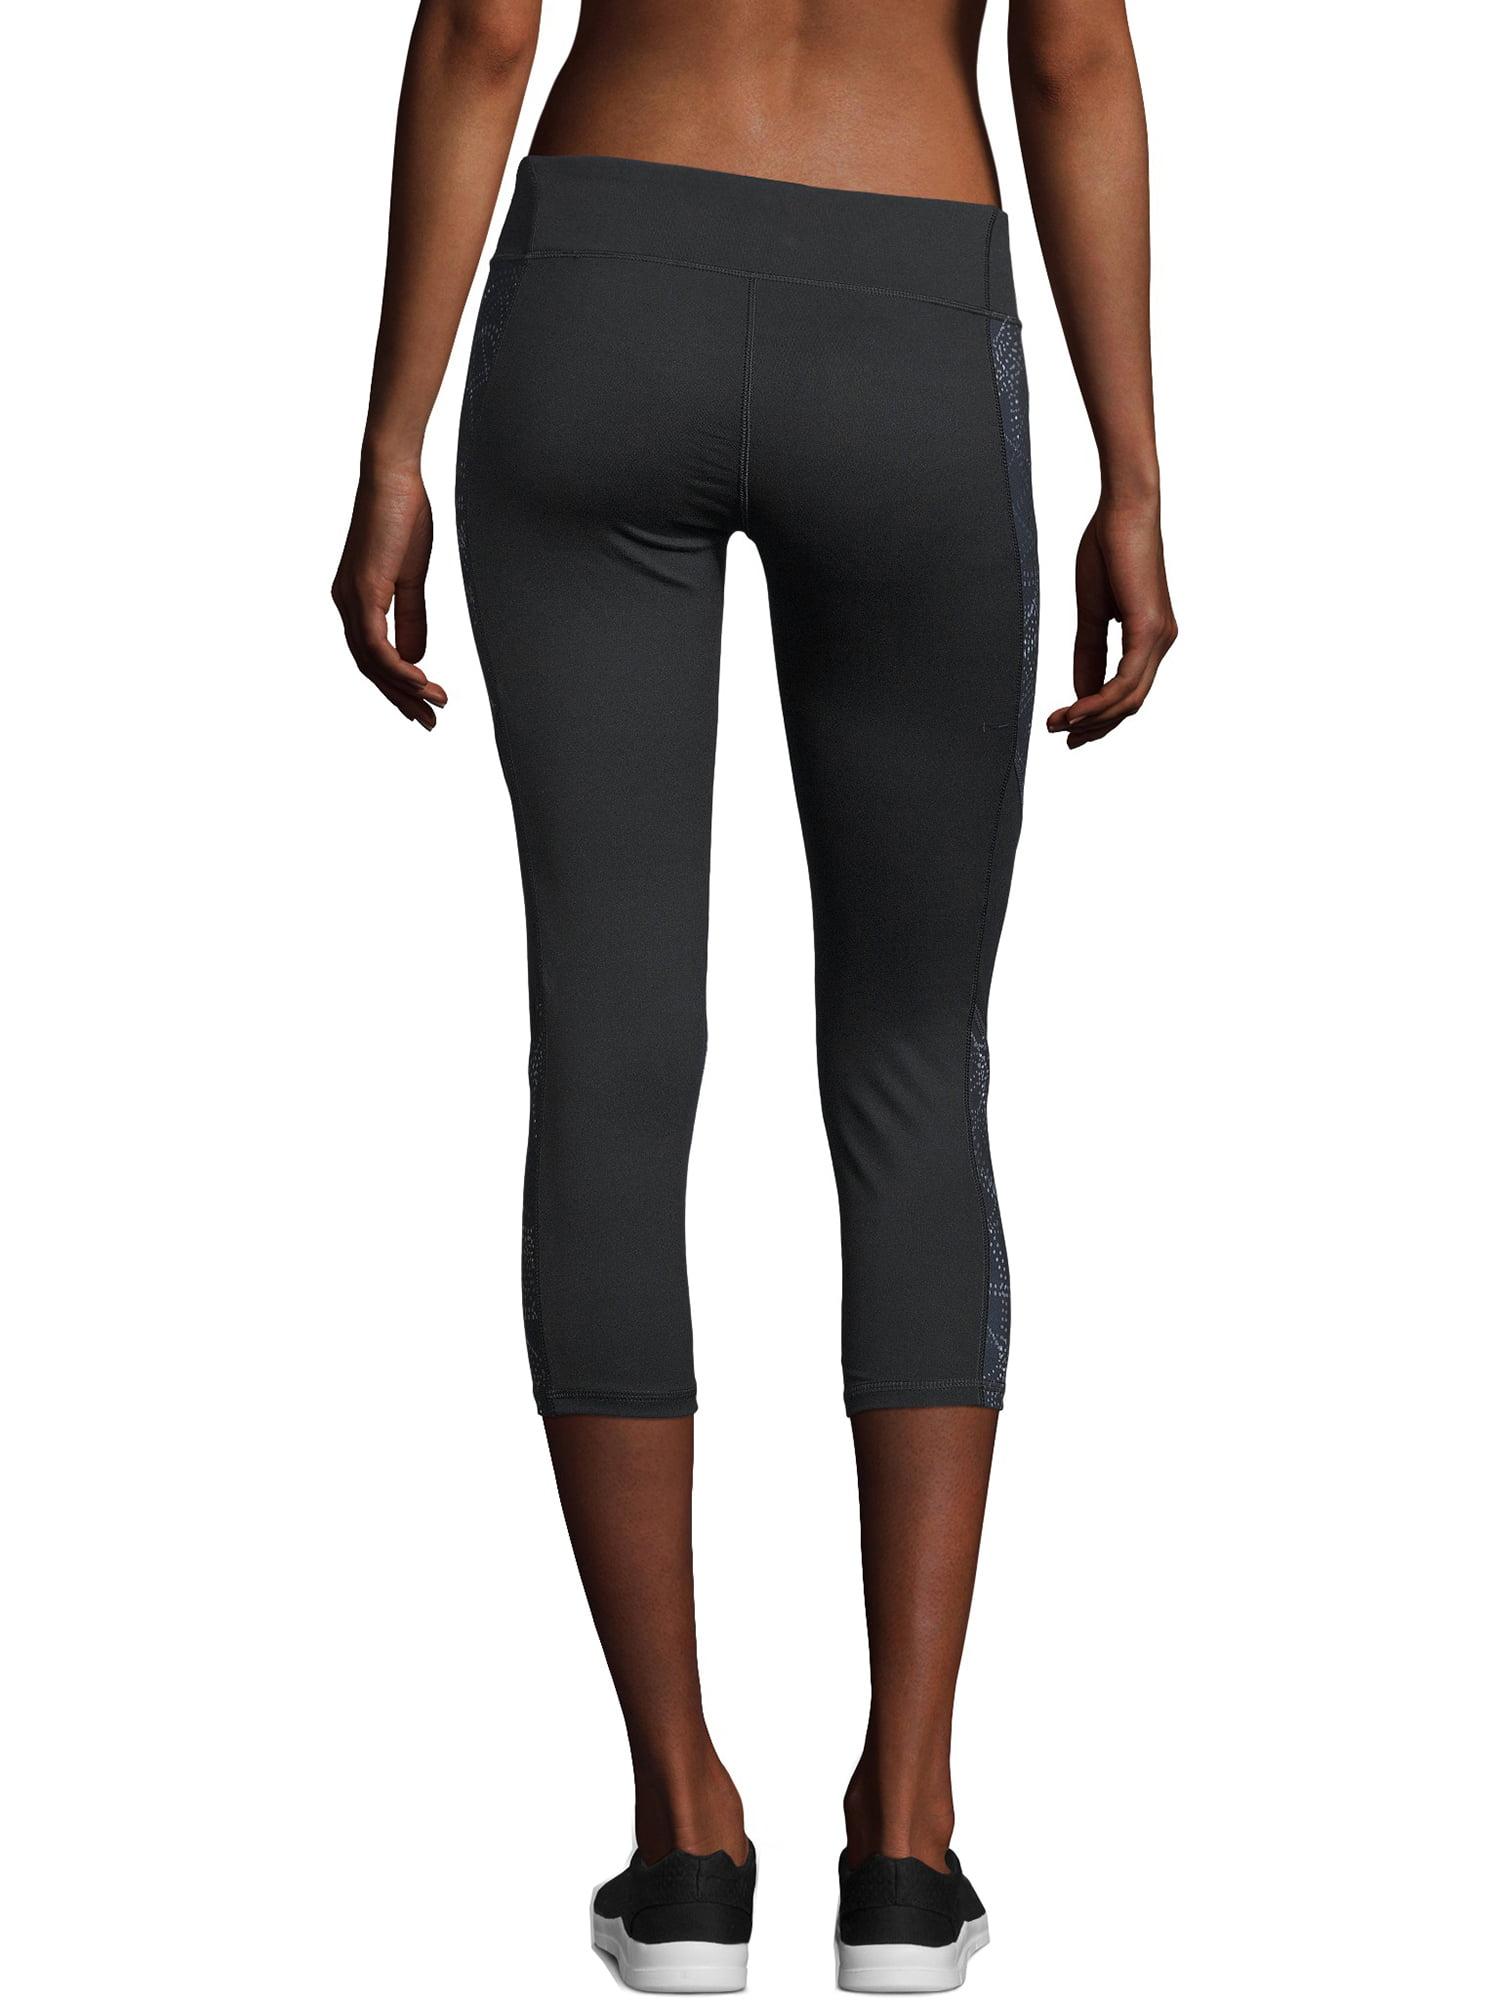 f019f7f9c8713 Hanes - Sport Women's Performance Capri Leggings w/ Inserts - Walmart.com